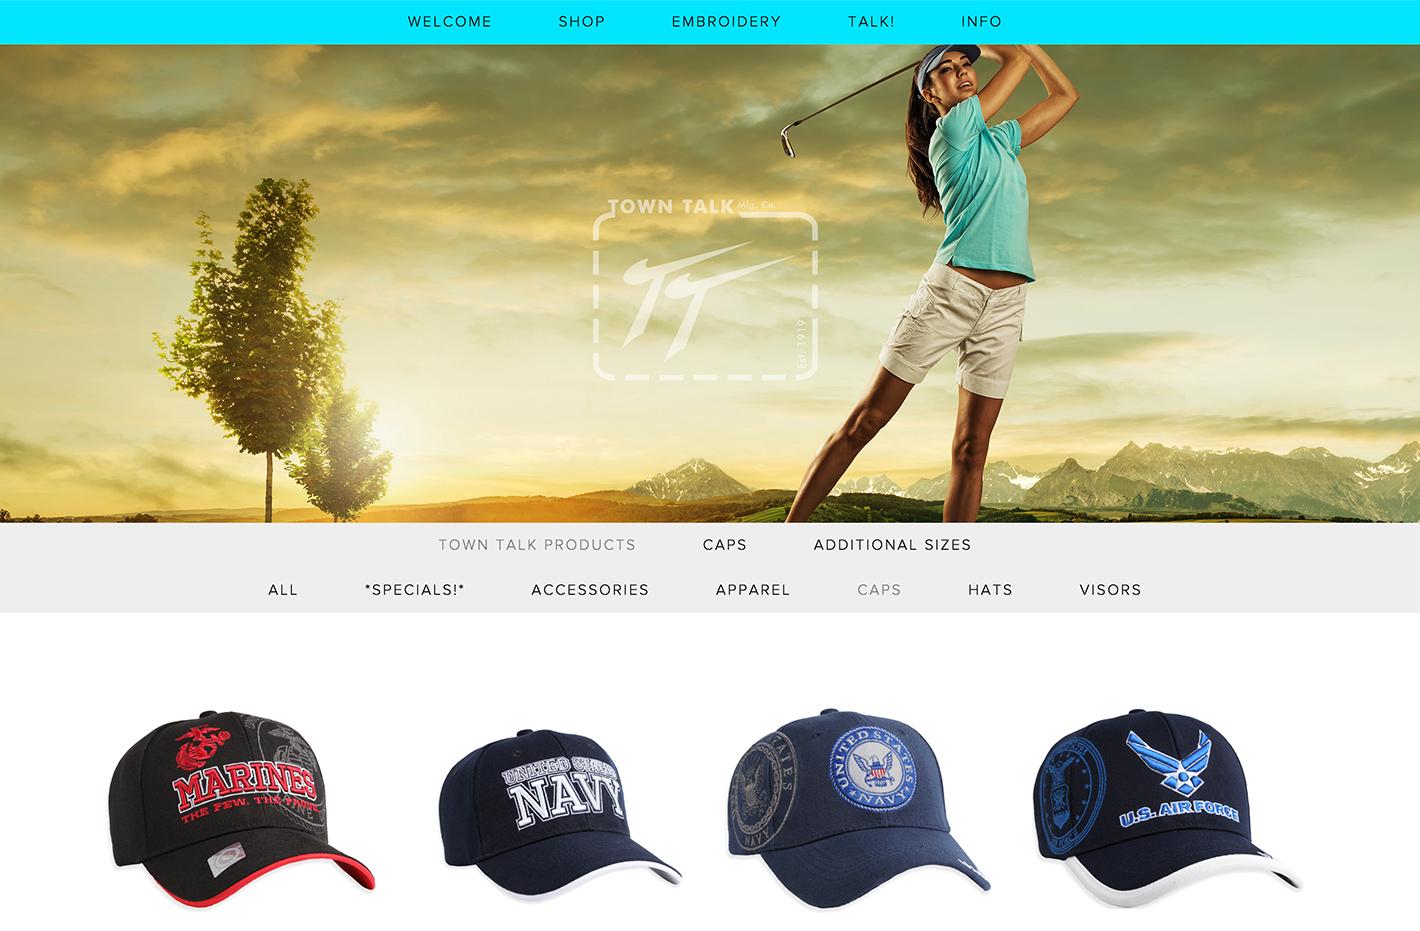 RetailEditorial.jpg